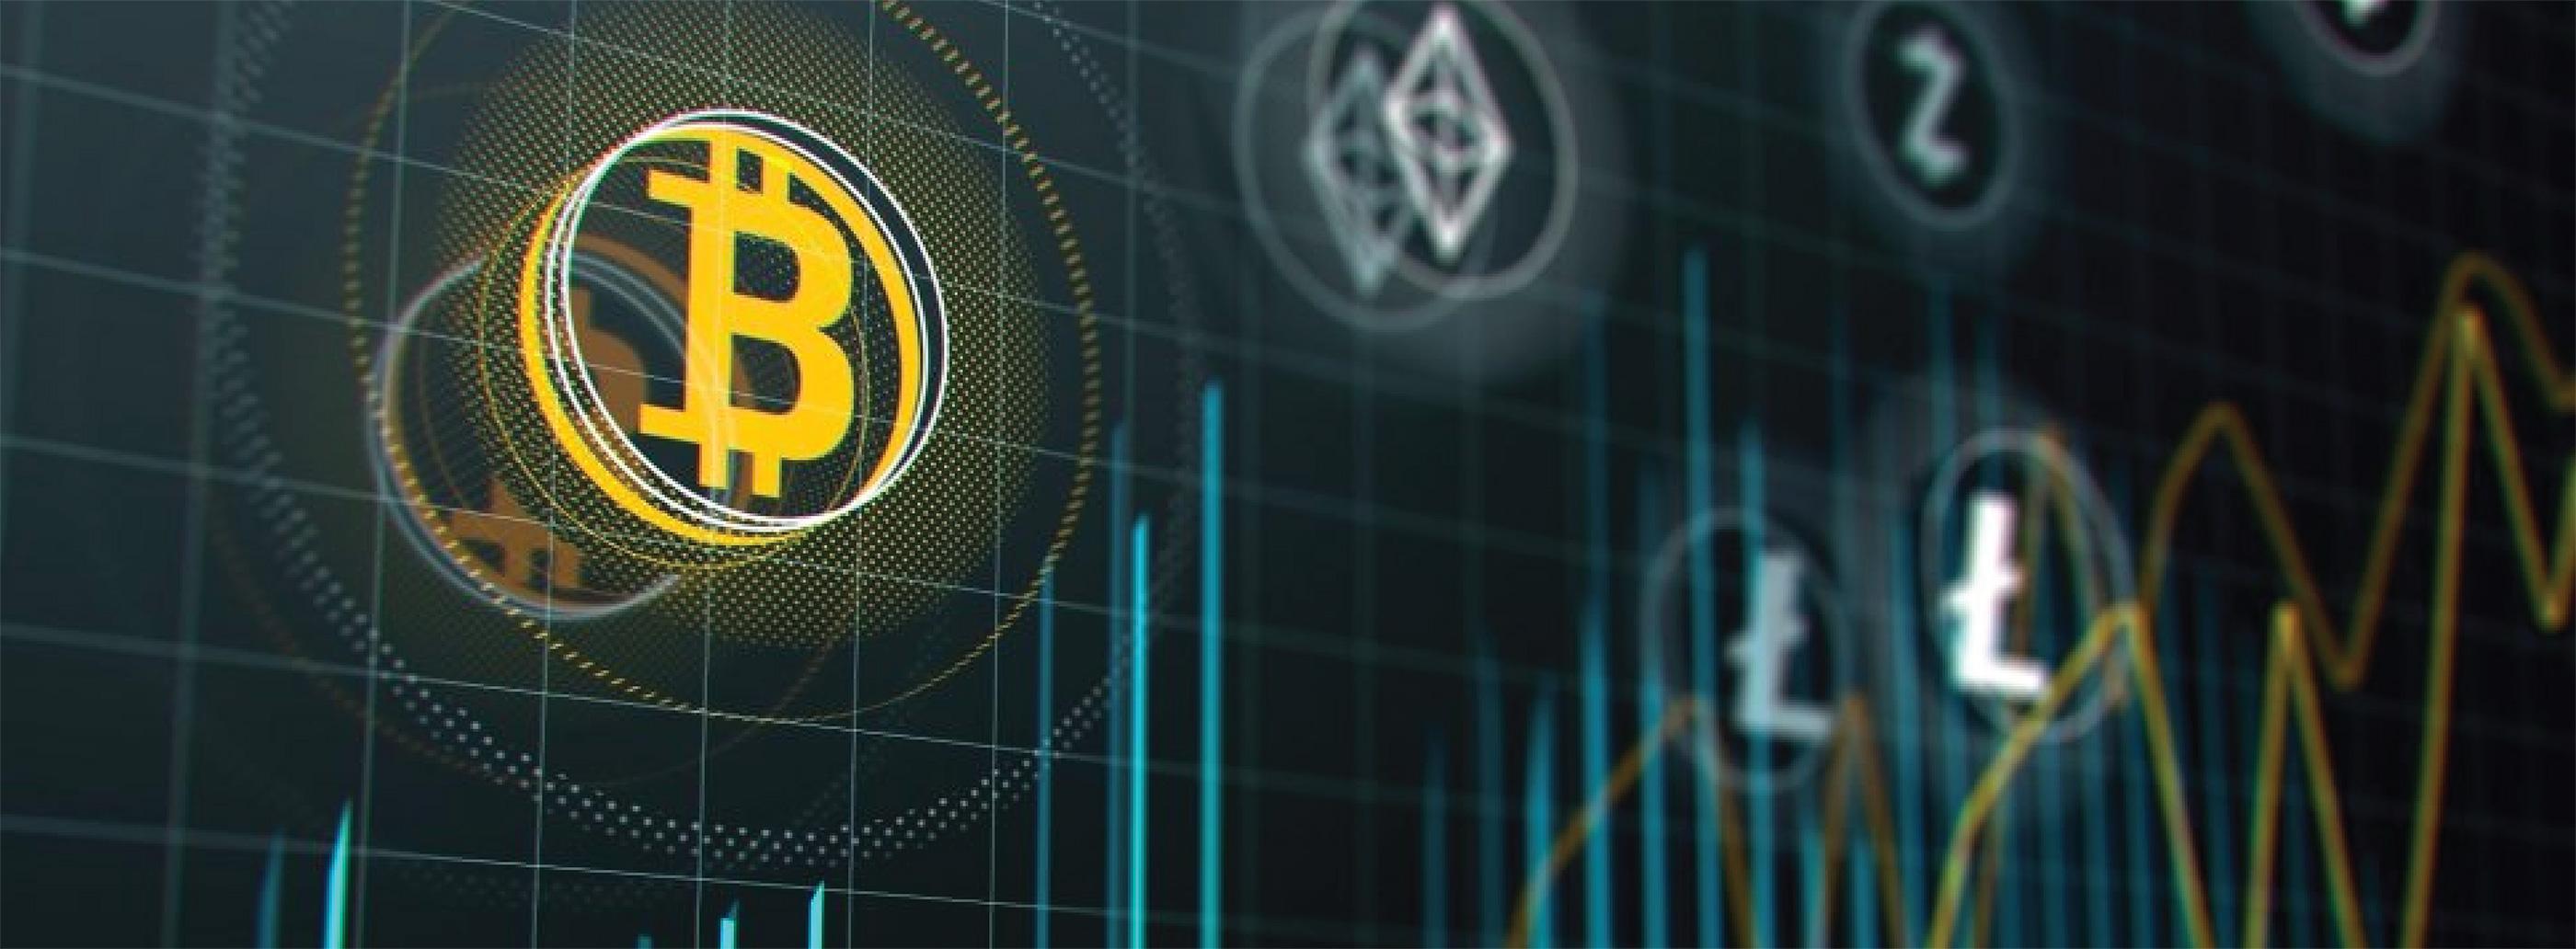 capri-bitcoin_banner-01.jpg